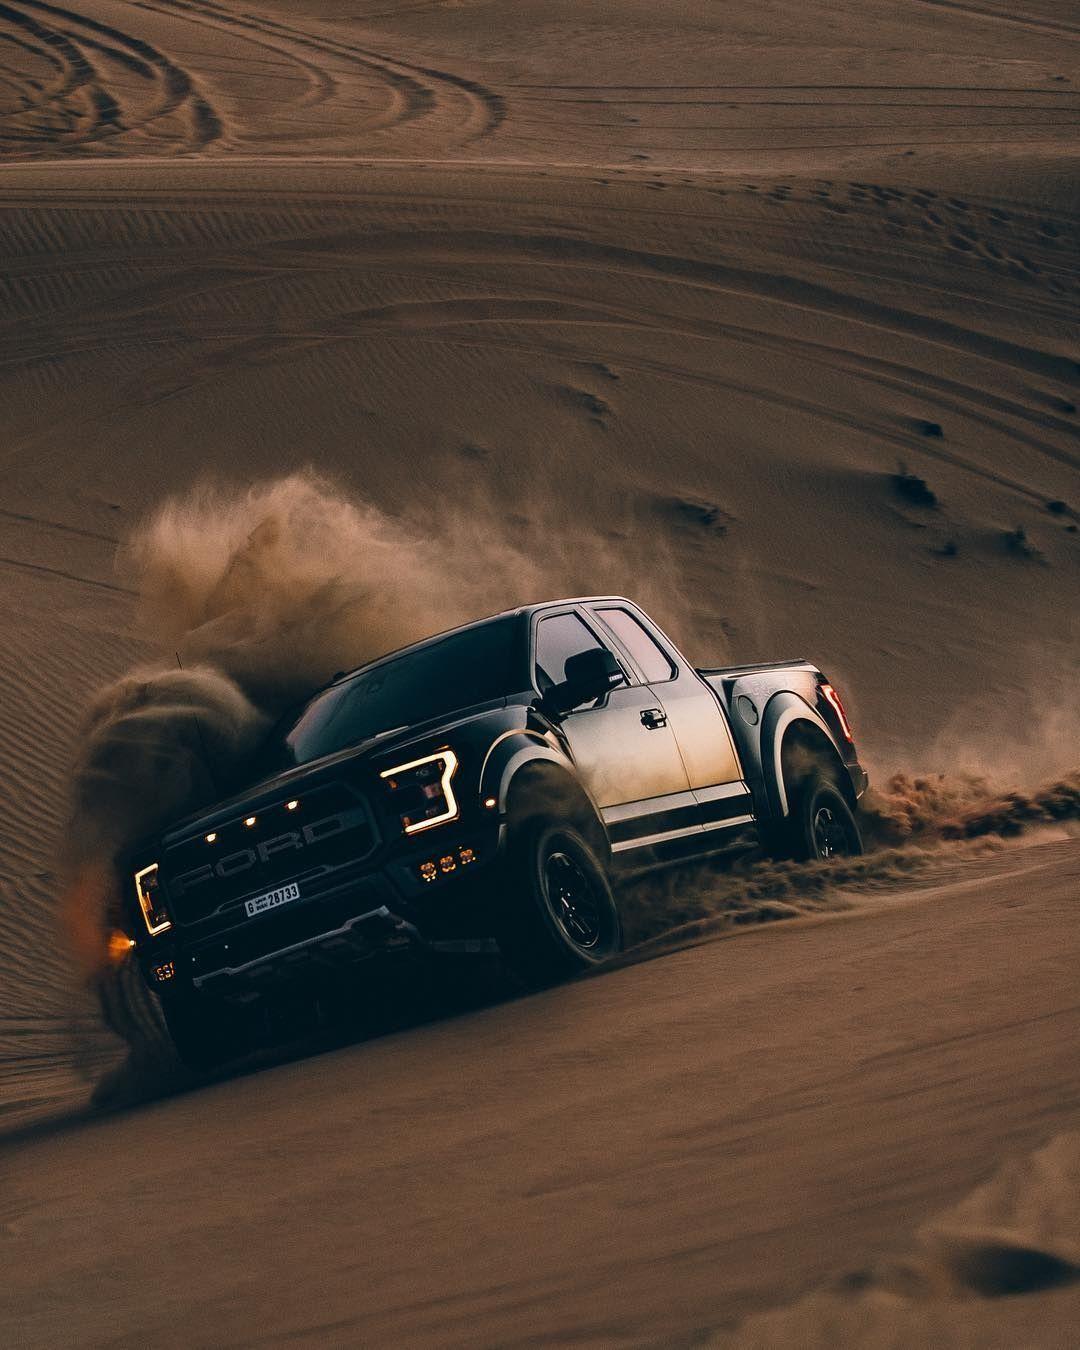 2019 Ford Svt Bronco Raptor Check More At Http Www Autocarblog Club 2018 05 02 2019 Ford Svt Bronco Raptor